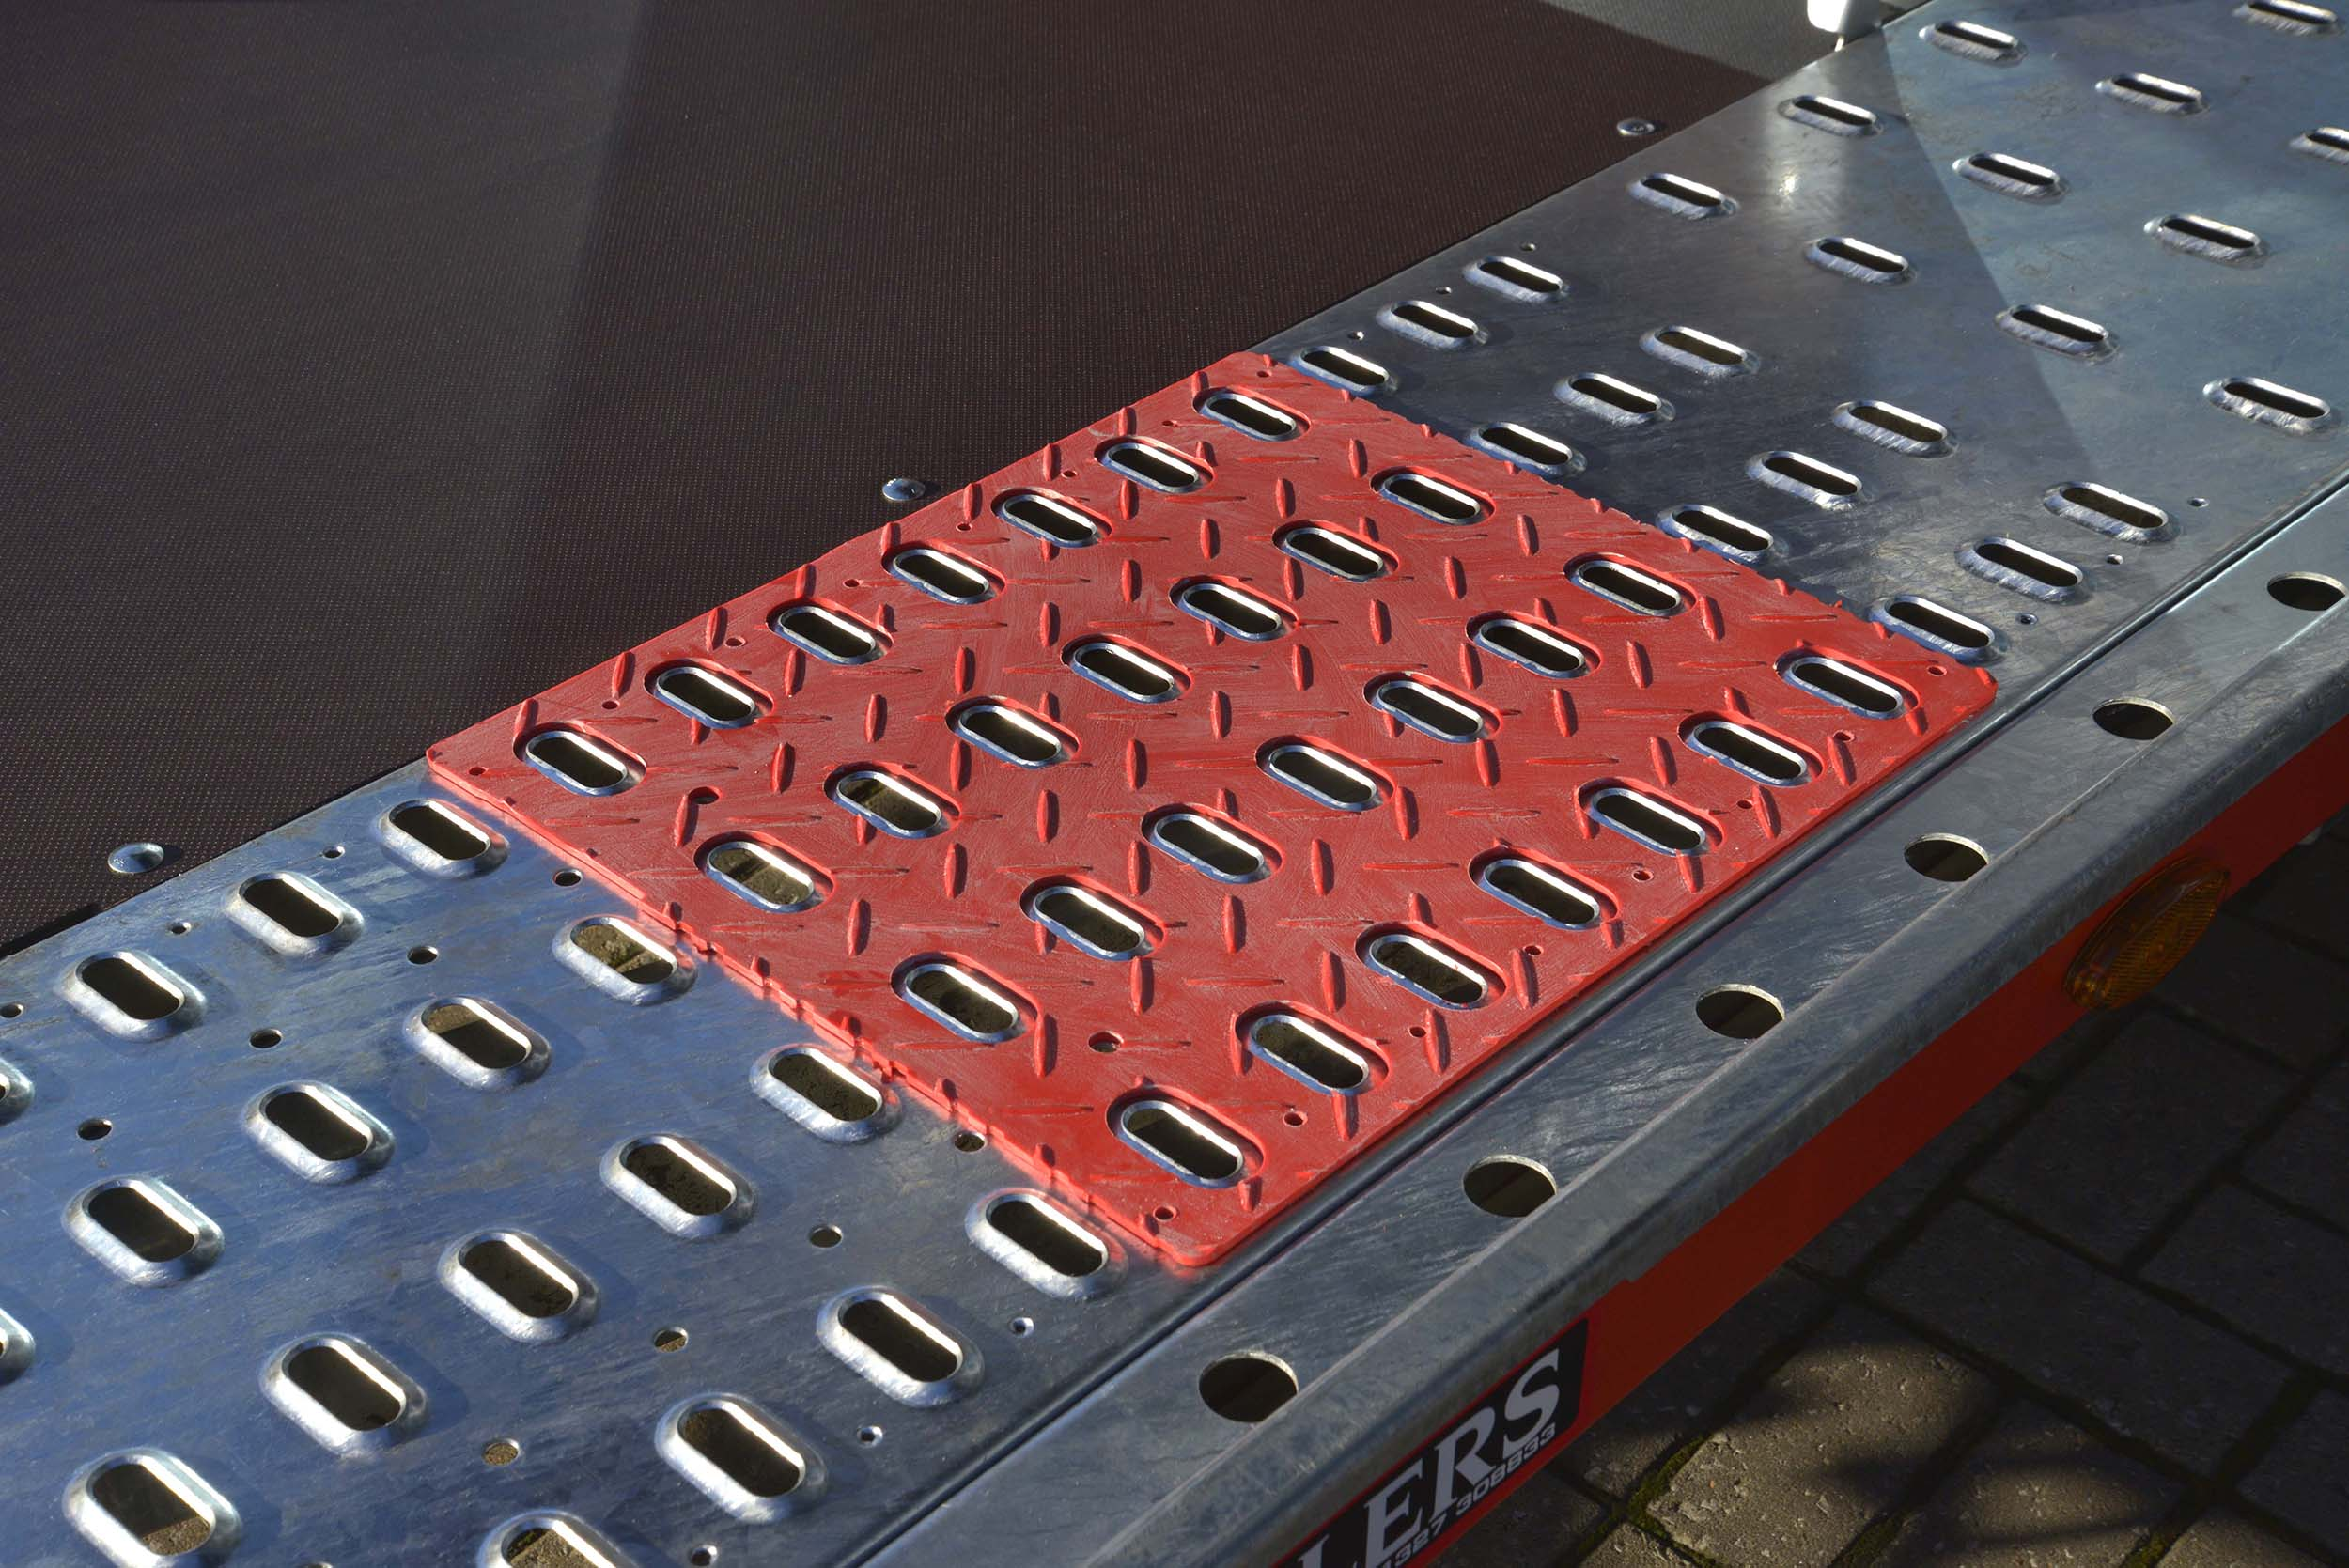 Brian James Trailer - slick pads on trailer